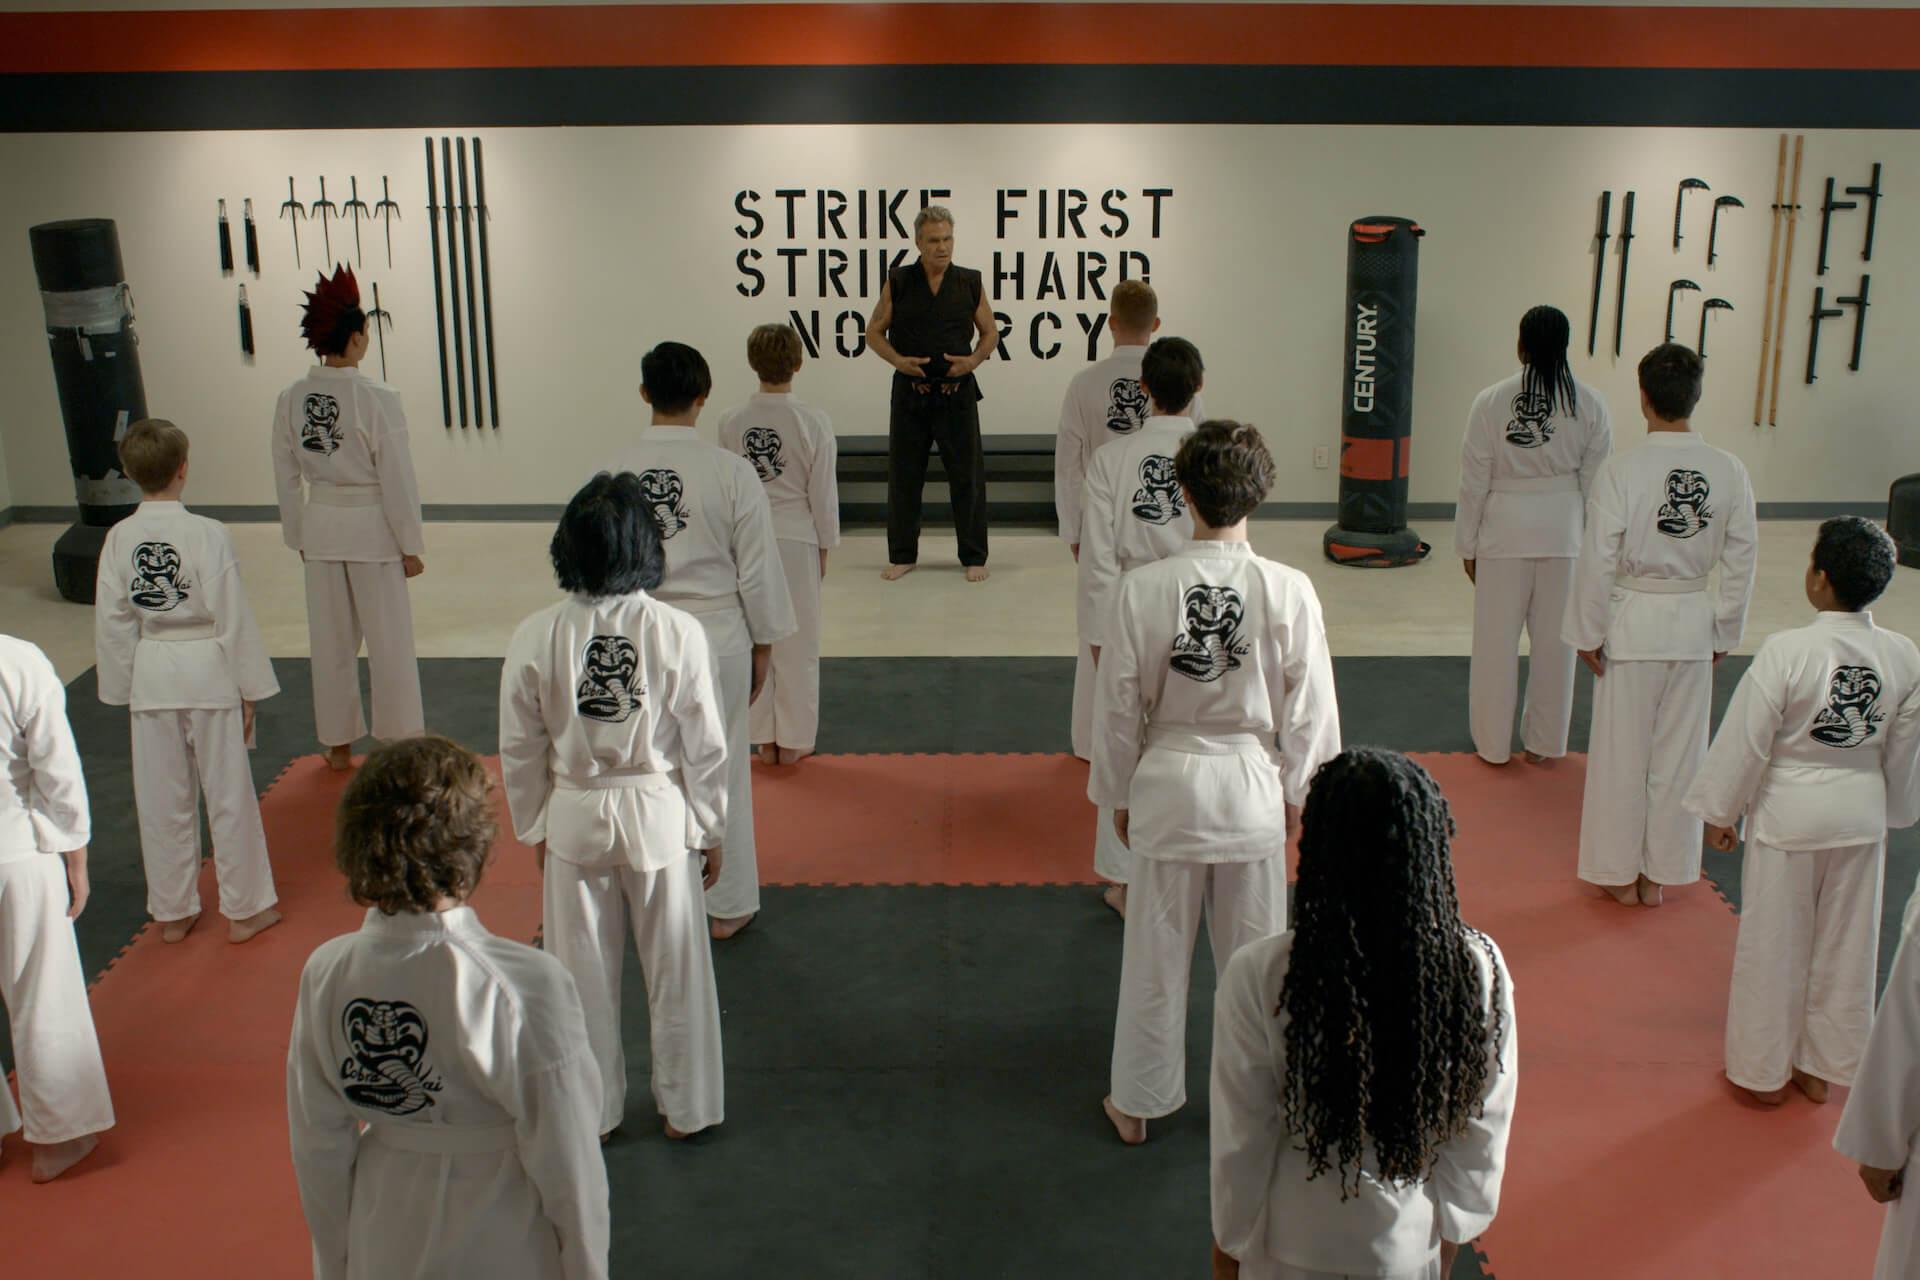 Netflix1月配信コンテンツに『パラサイト 半地下の家族』が登場!『コブラ会』『スノーピアサー』新シーズンなど多数ラインナップ art201218_netflix_jan_1